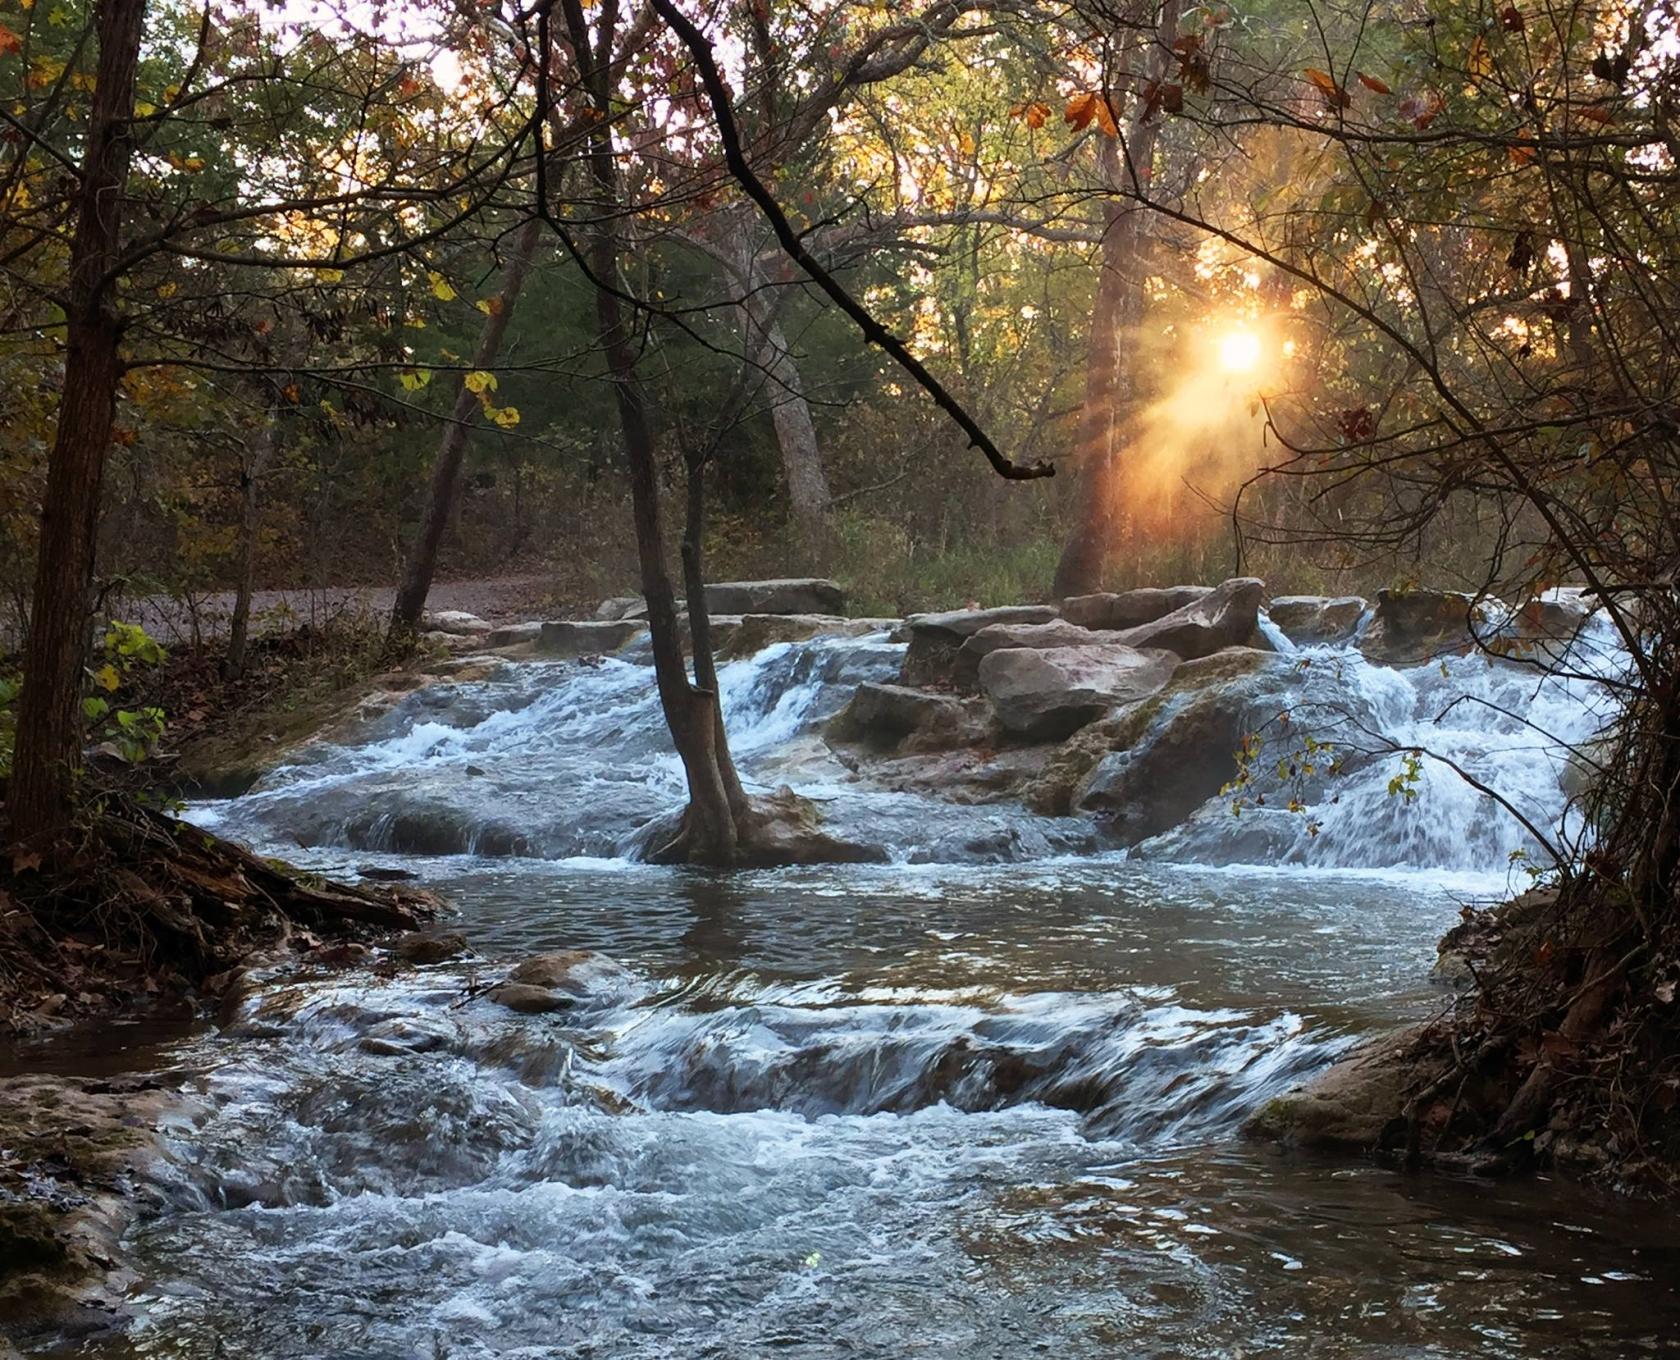 Little Niagara falls at Chickasaw National Recreation Area